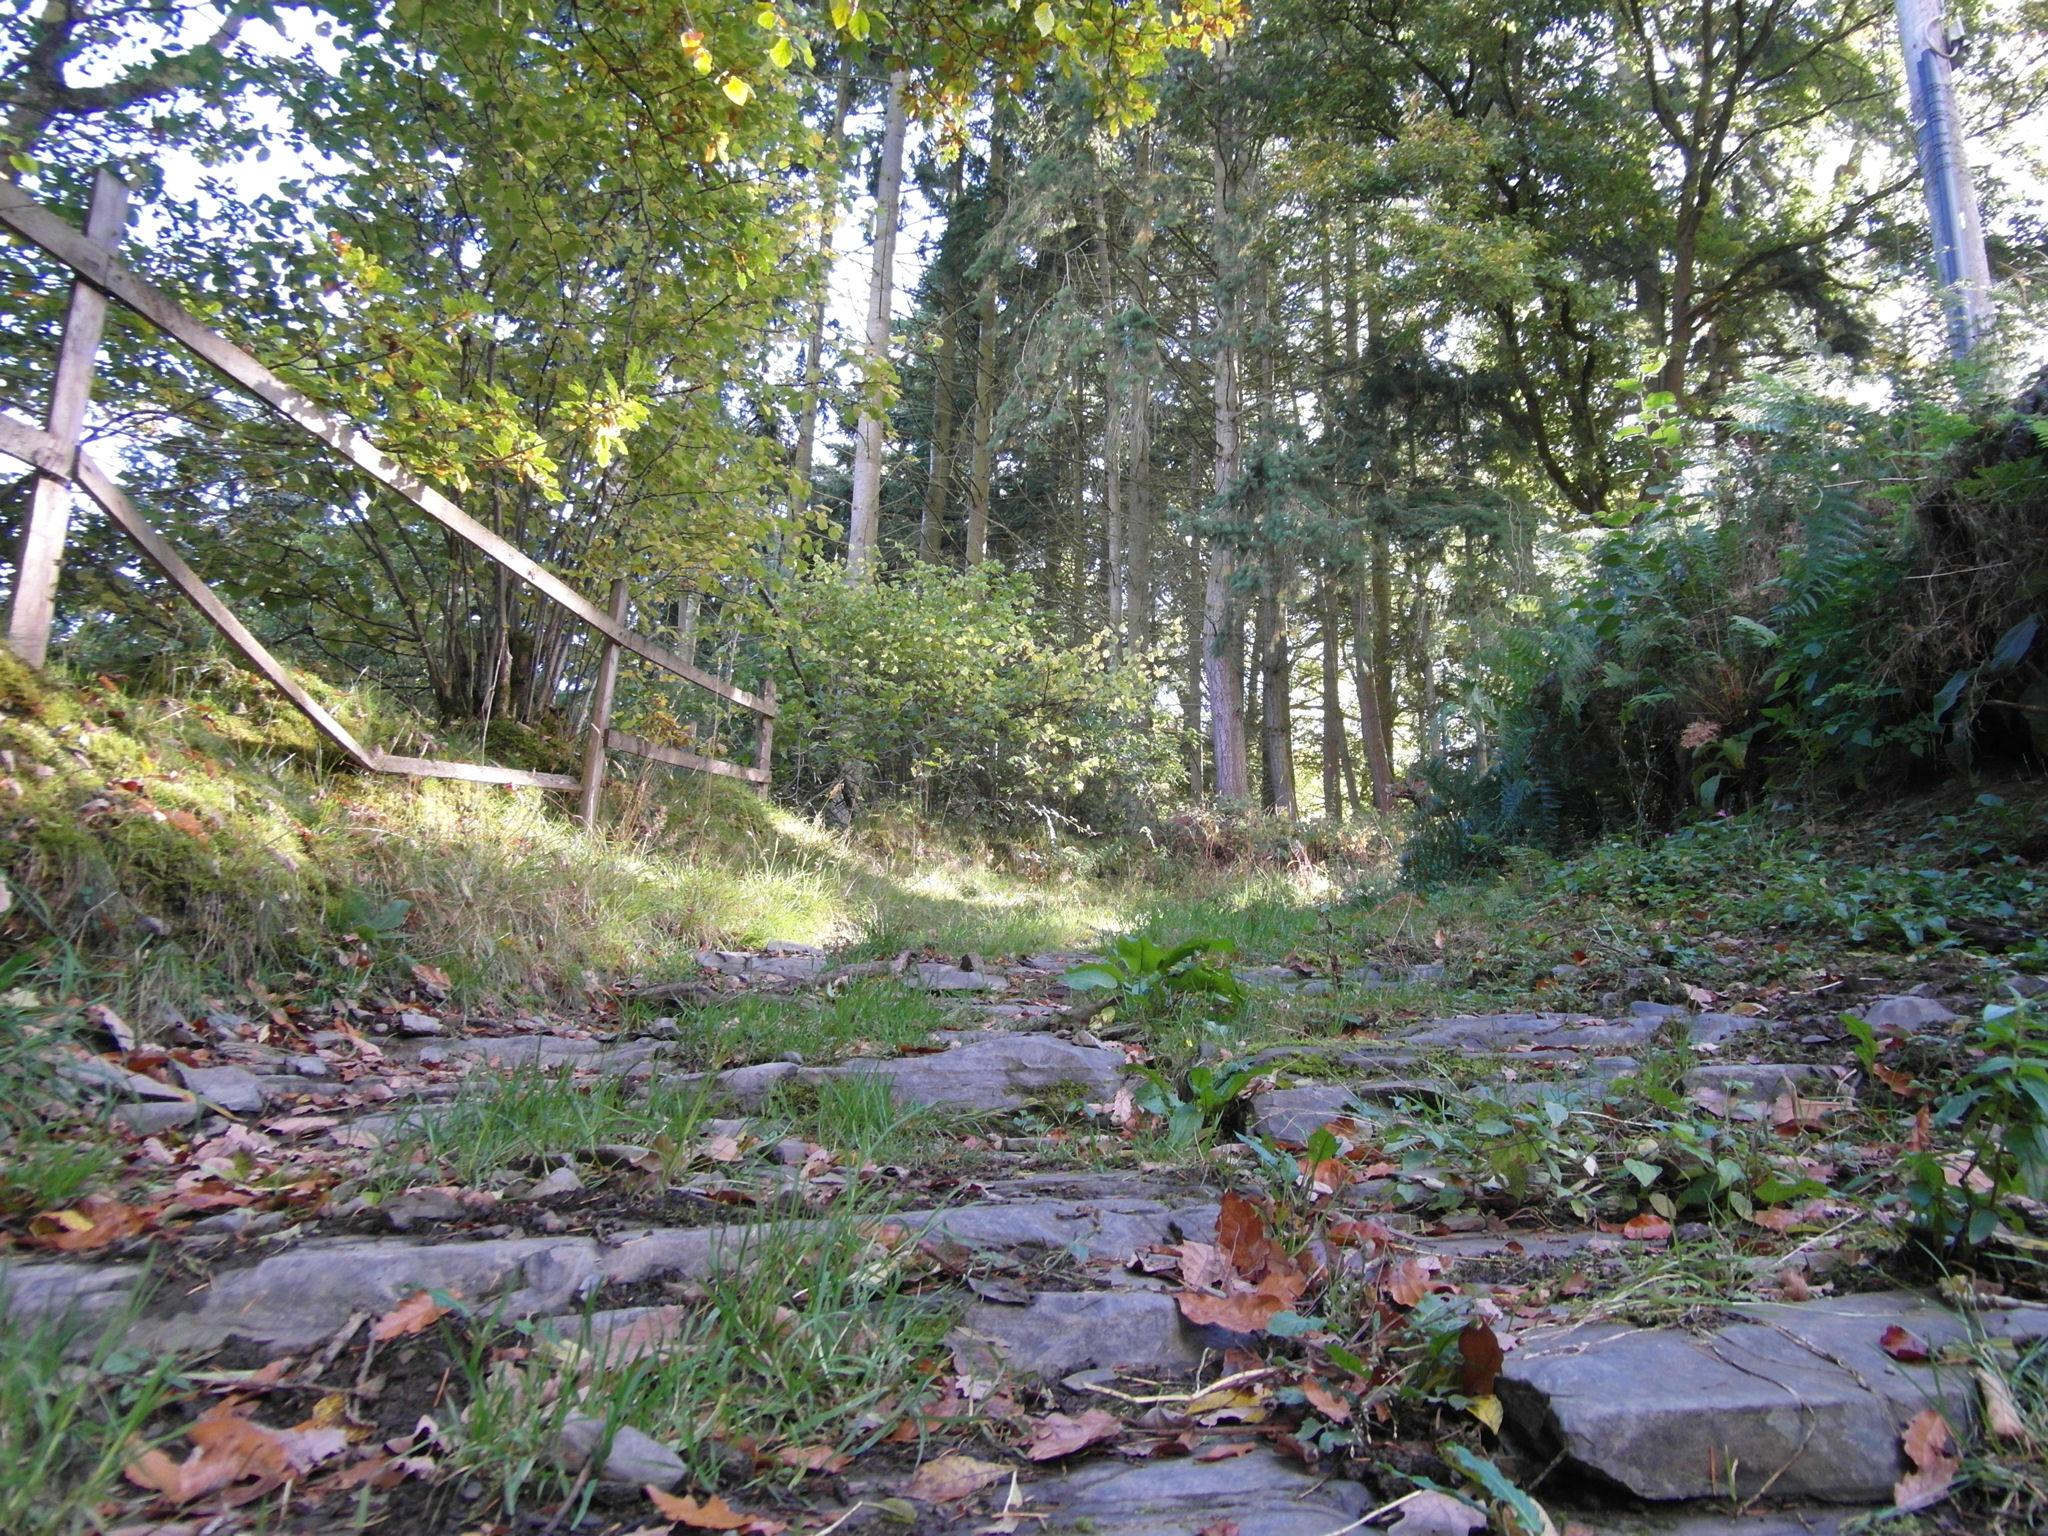 Uphill Backyard Landscaping - 28 Images - Shady Woodland Hillside Steps Simple Slab Steps ...